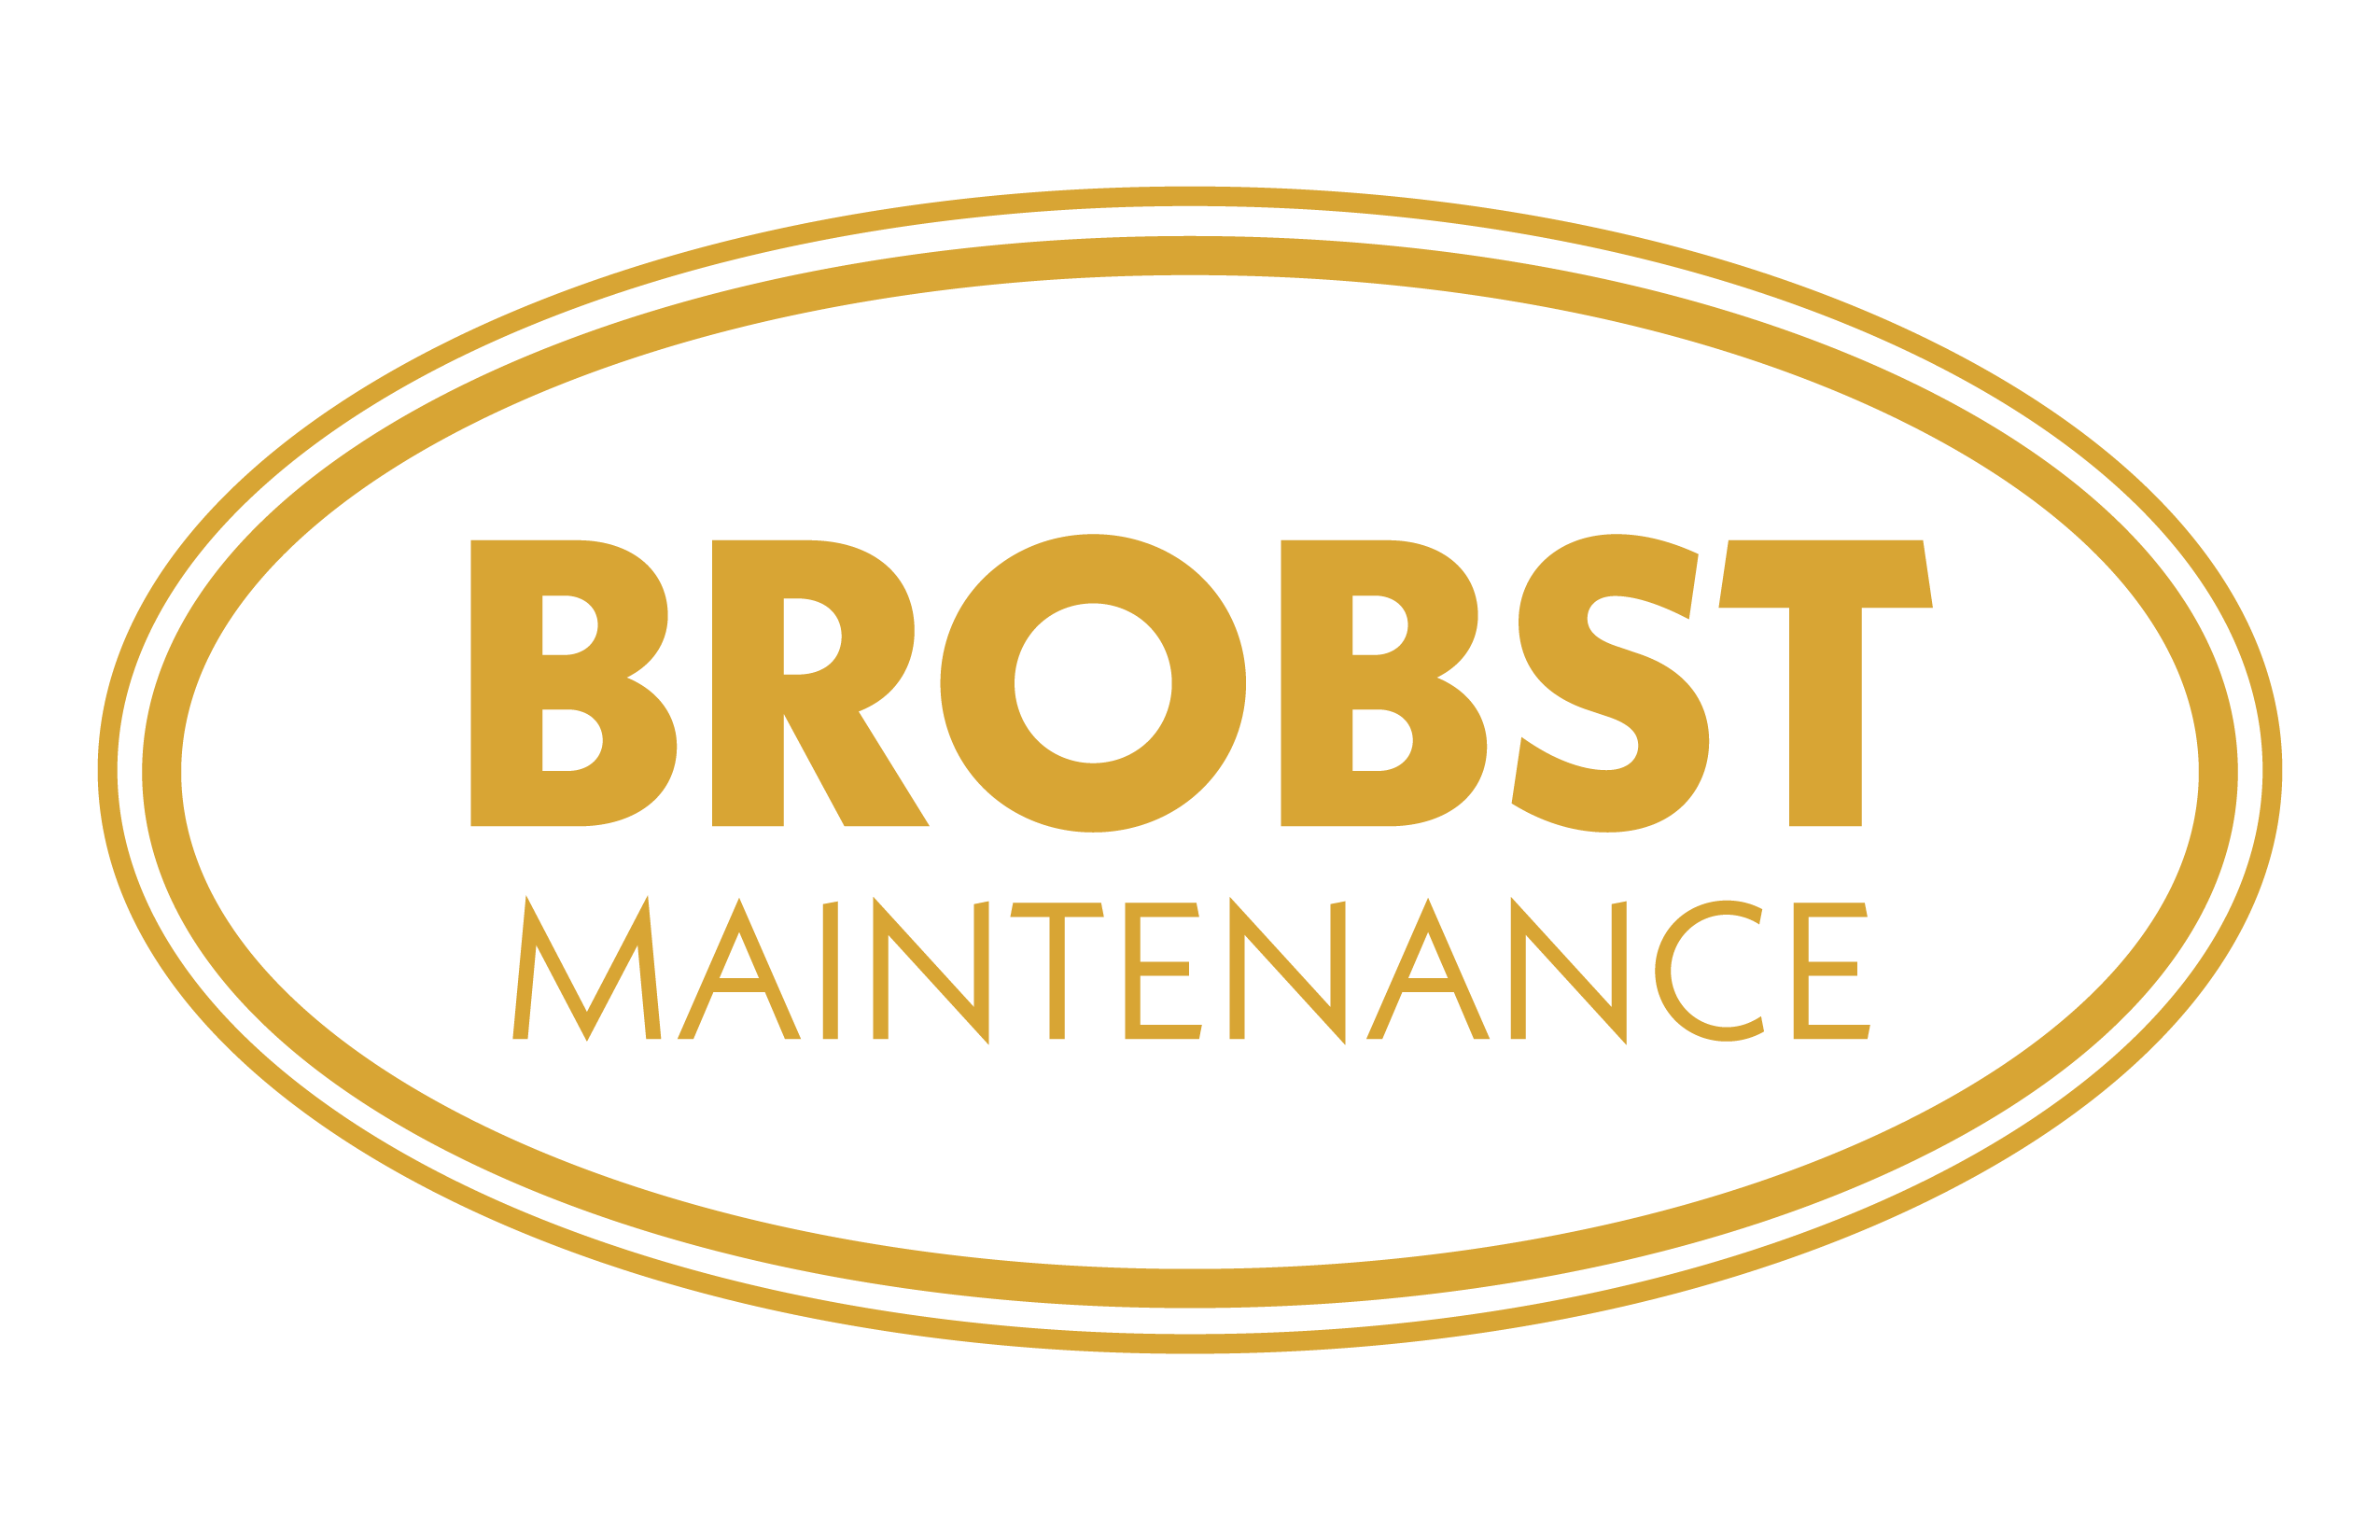 Brobst Maintenance